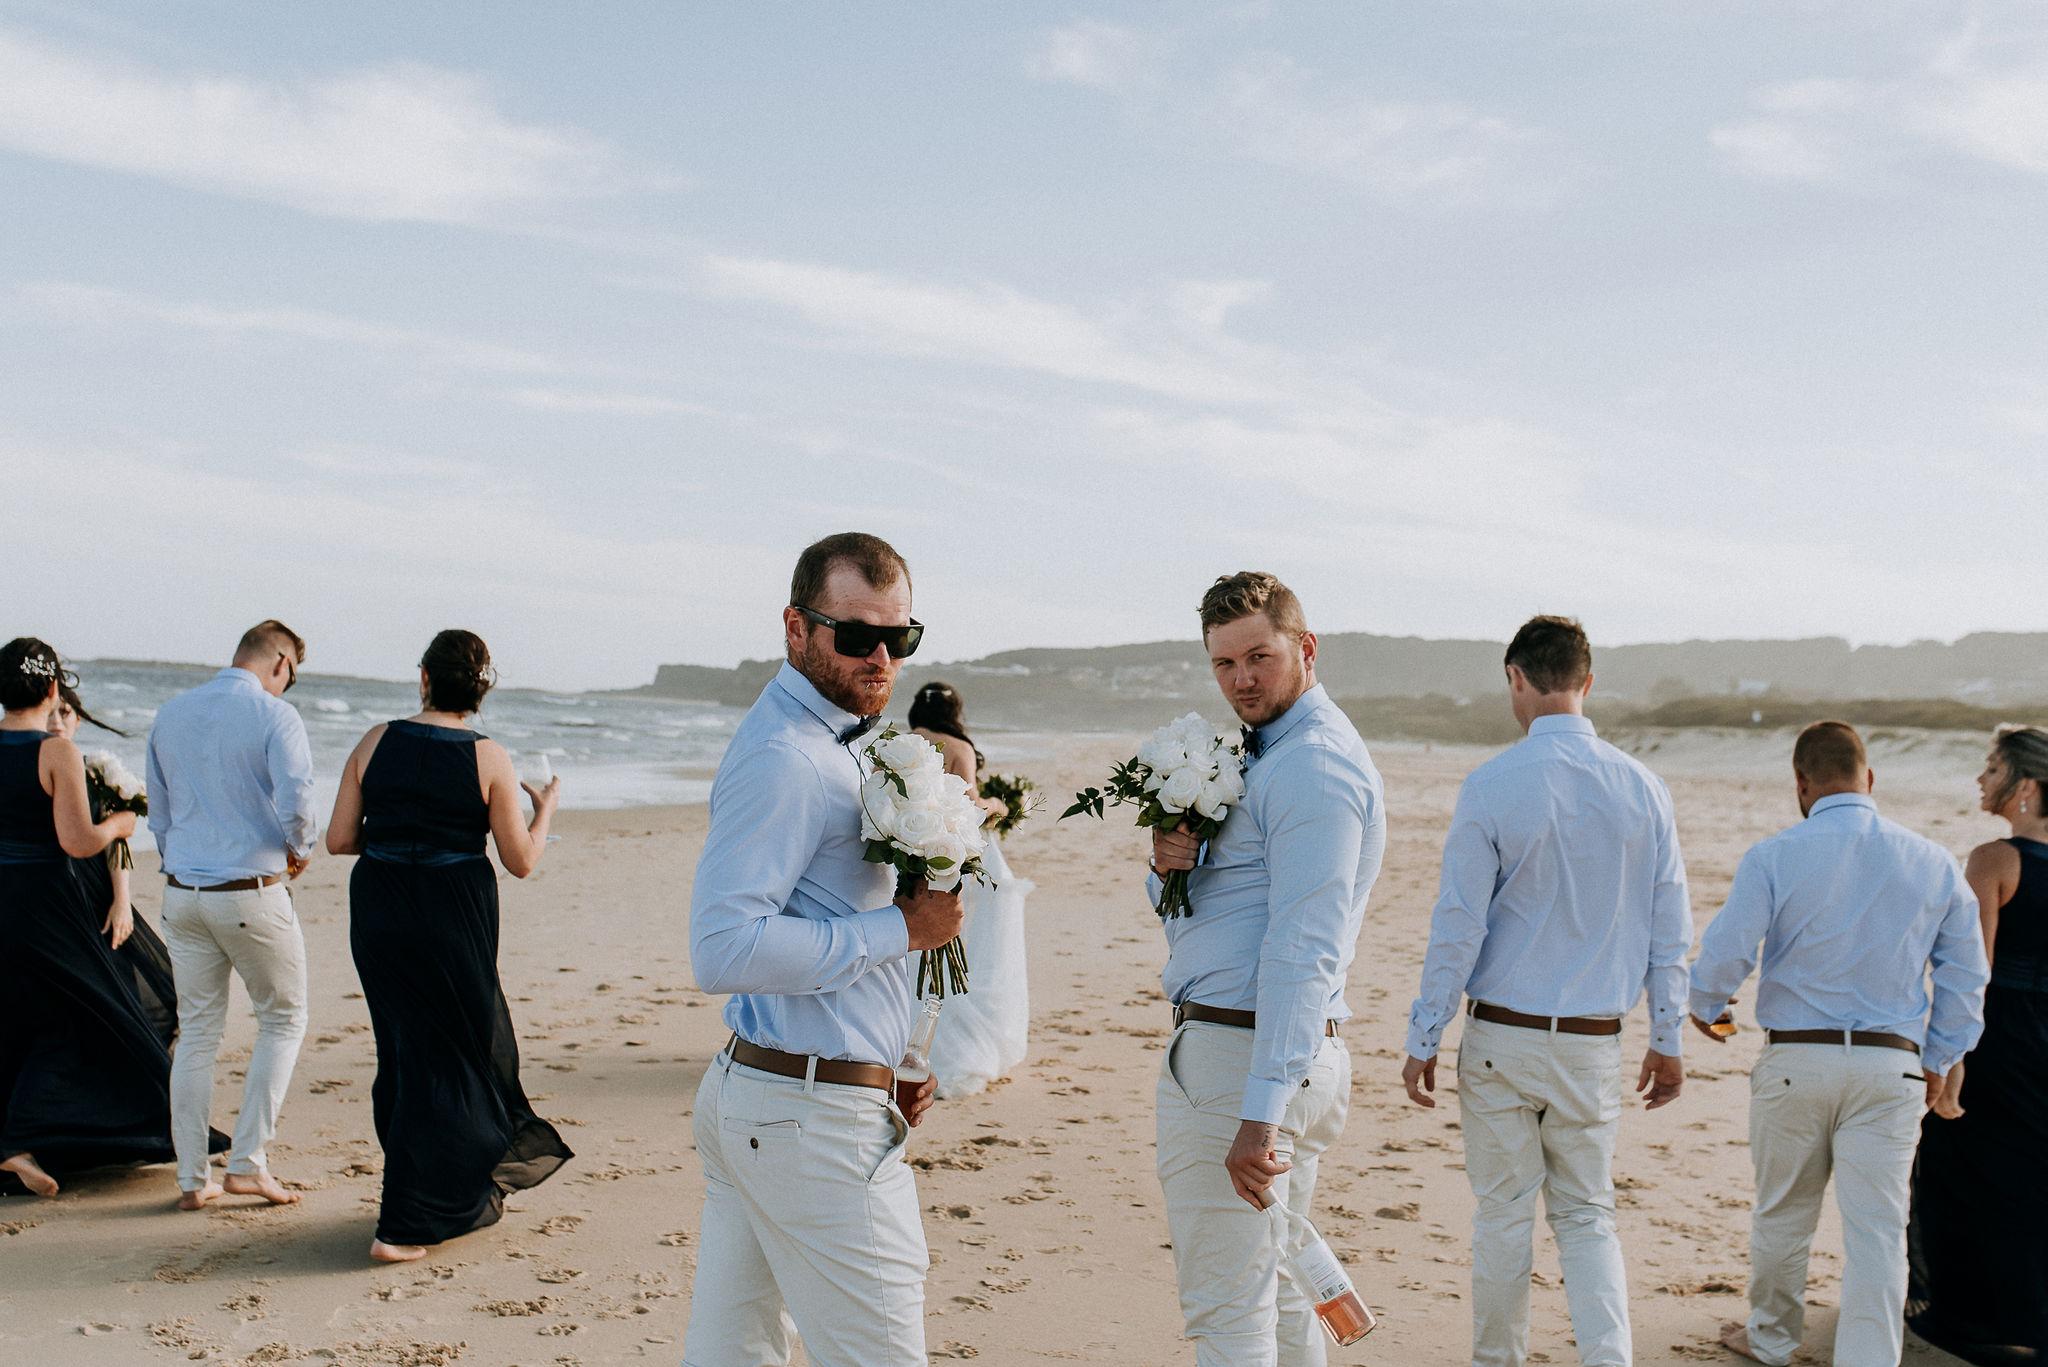 CAVES-BEACH-HOTEL-WEDDING-PATTEN-930.jpg